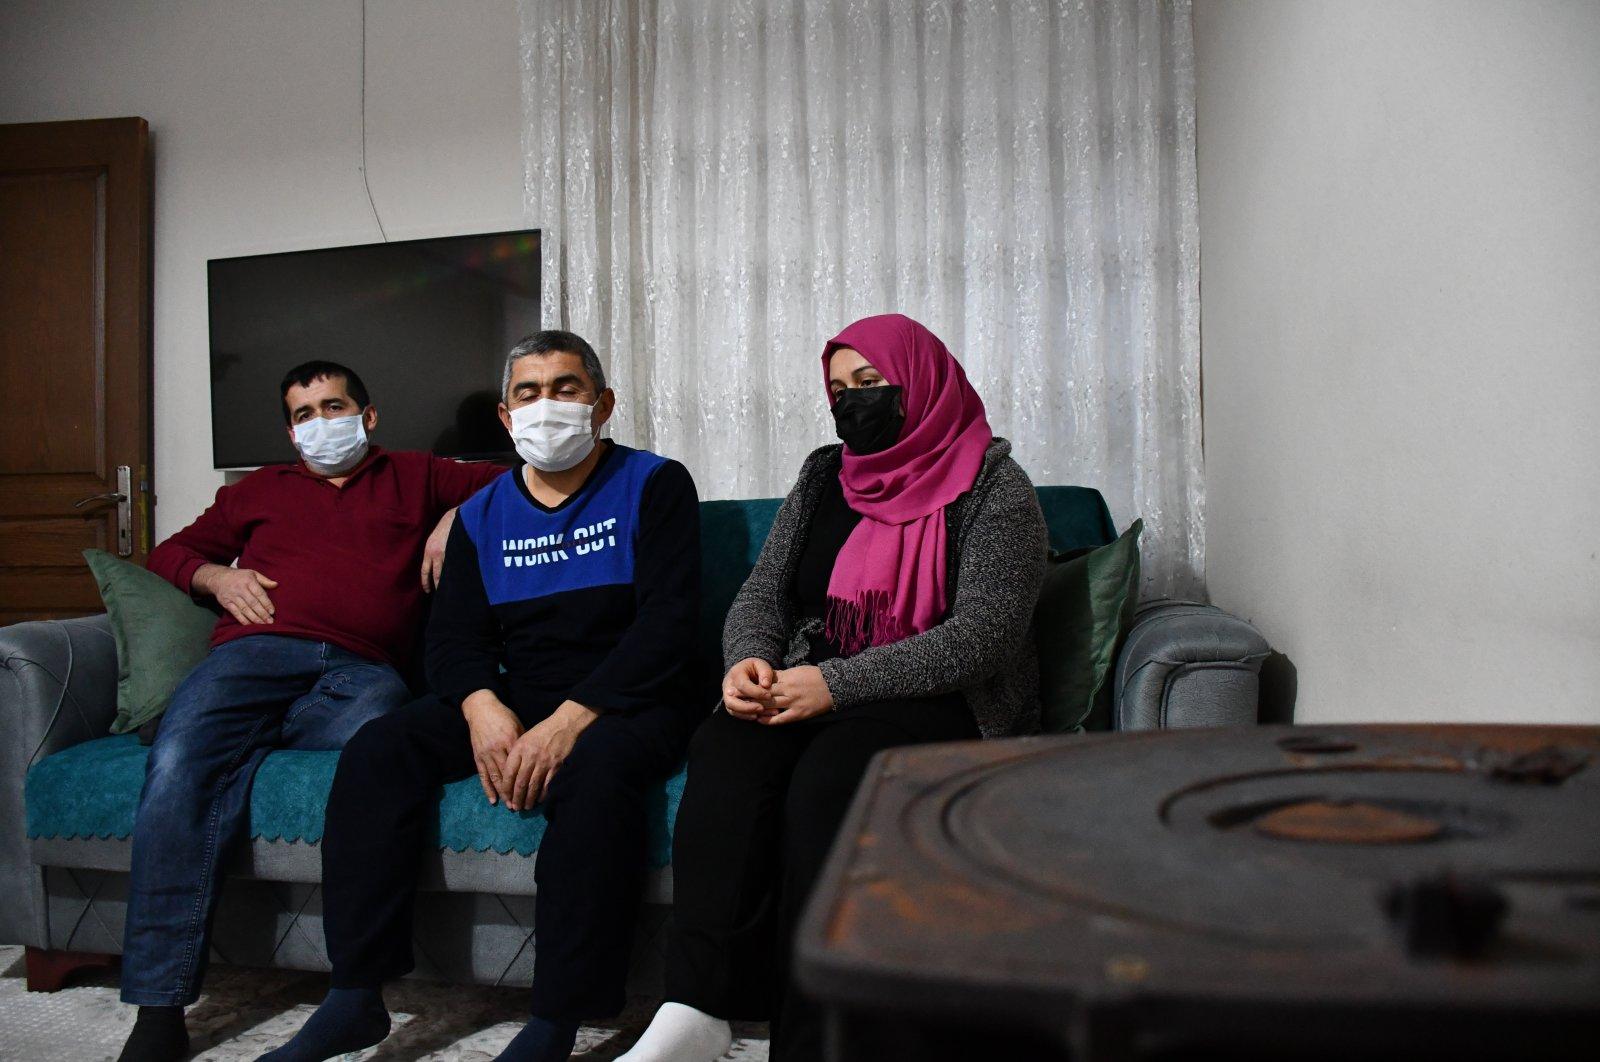 The Çalık family in Turkey's southern province Adana awaits the return of kidnapped Turkish worker Nurettin Çalık from Libya, Jan. 13, 2021. (AA Photo)